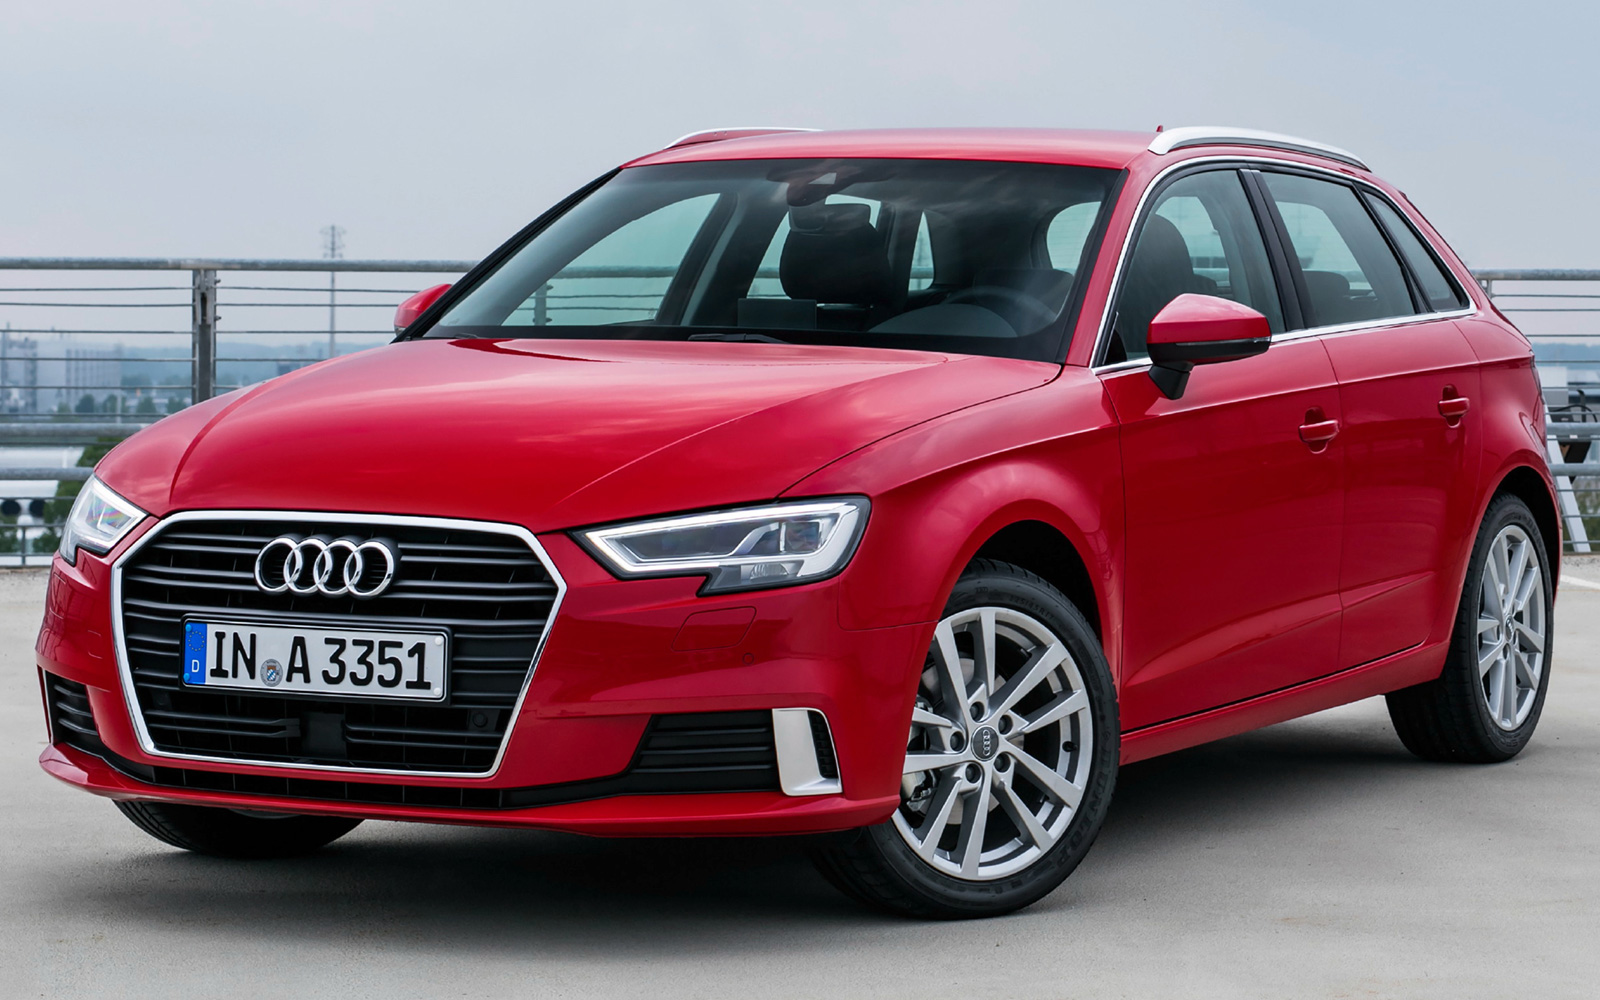 Технические характеристики Audi A3 / Ауди А3, справочник ...